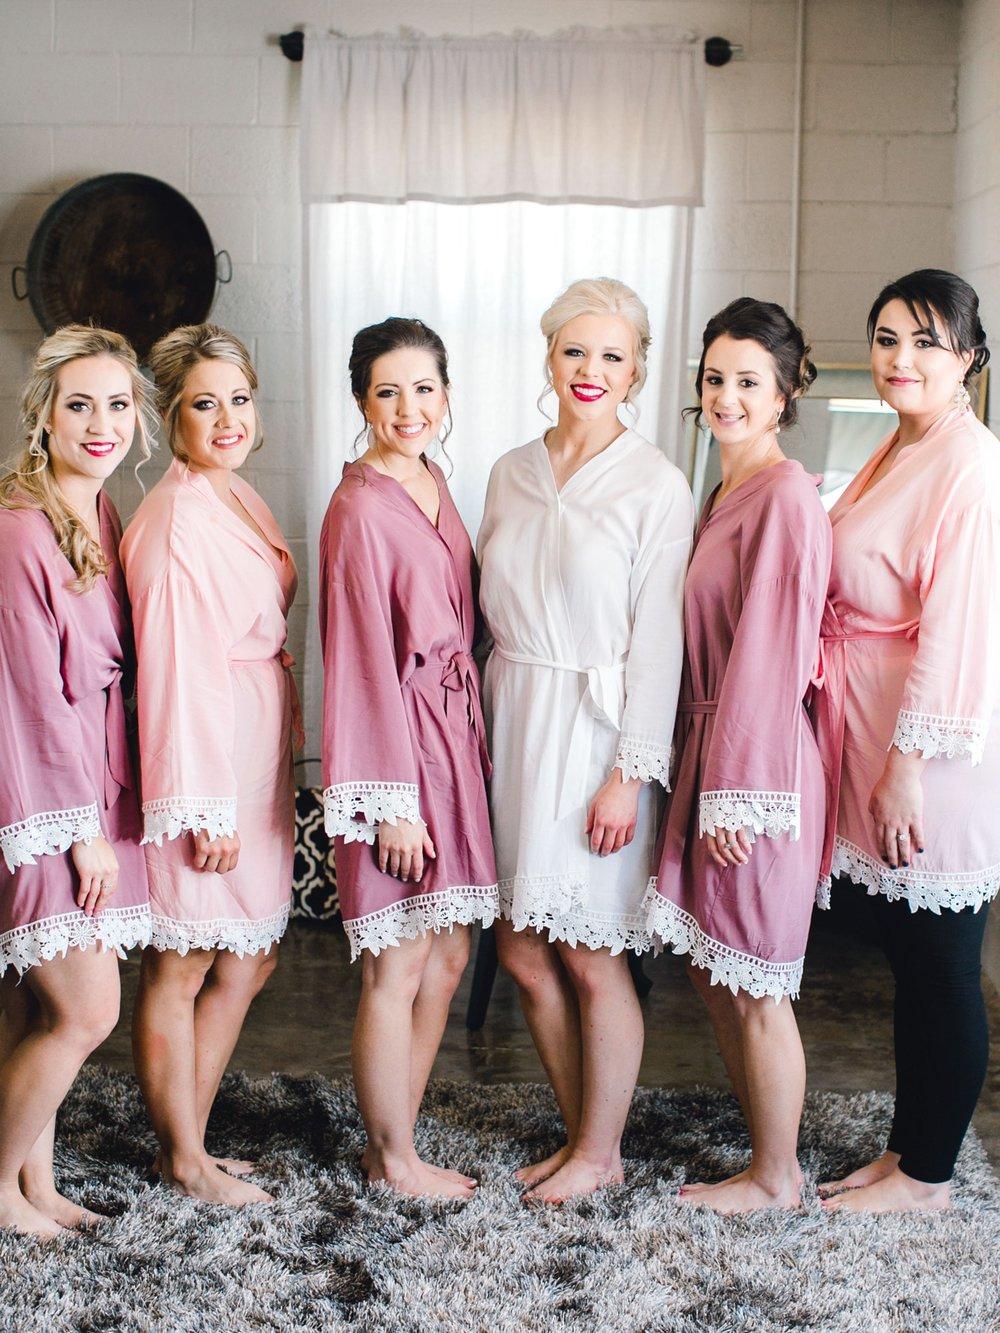 Jenna-and-garrett-Everett-kitalou-gin-lubbock-wedding-dayspring-designs-lubbock-wedding-photographer_0025.jpg